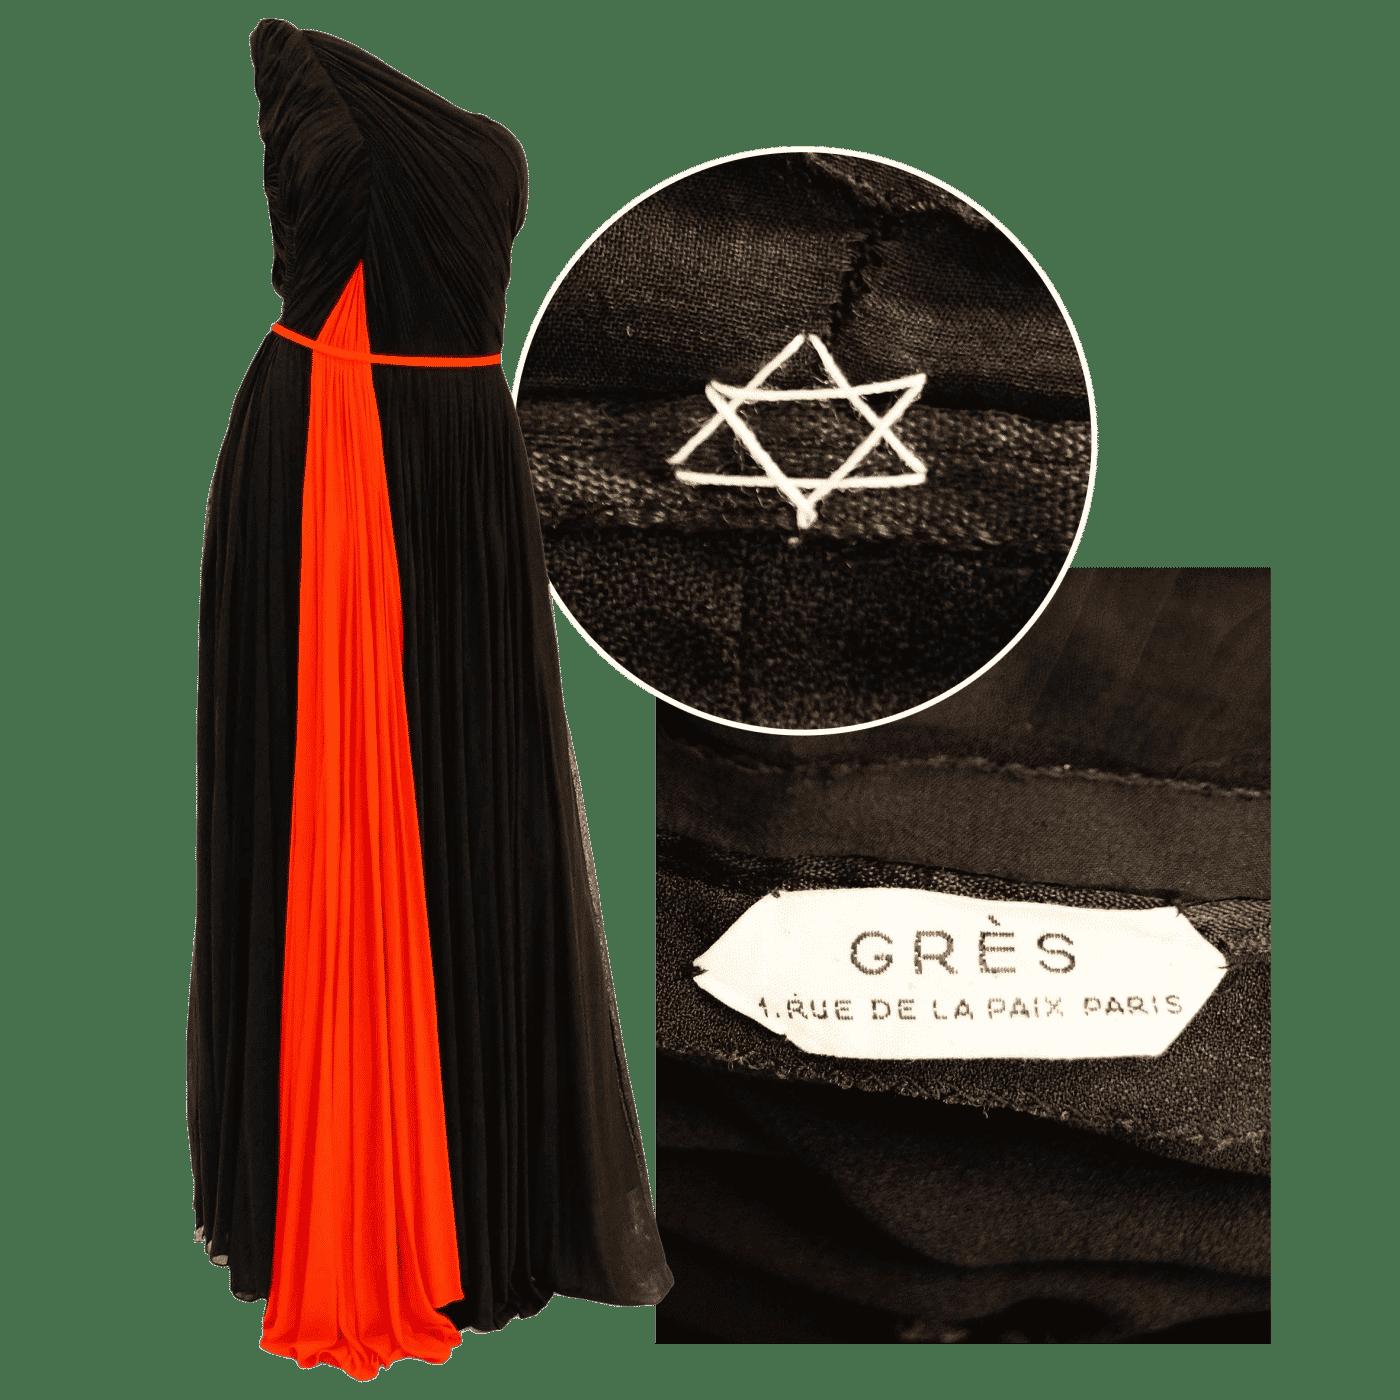 World Warr II-era Madame Grès gown with Star of David emblem sewn inside